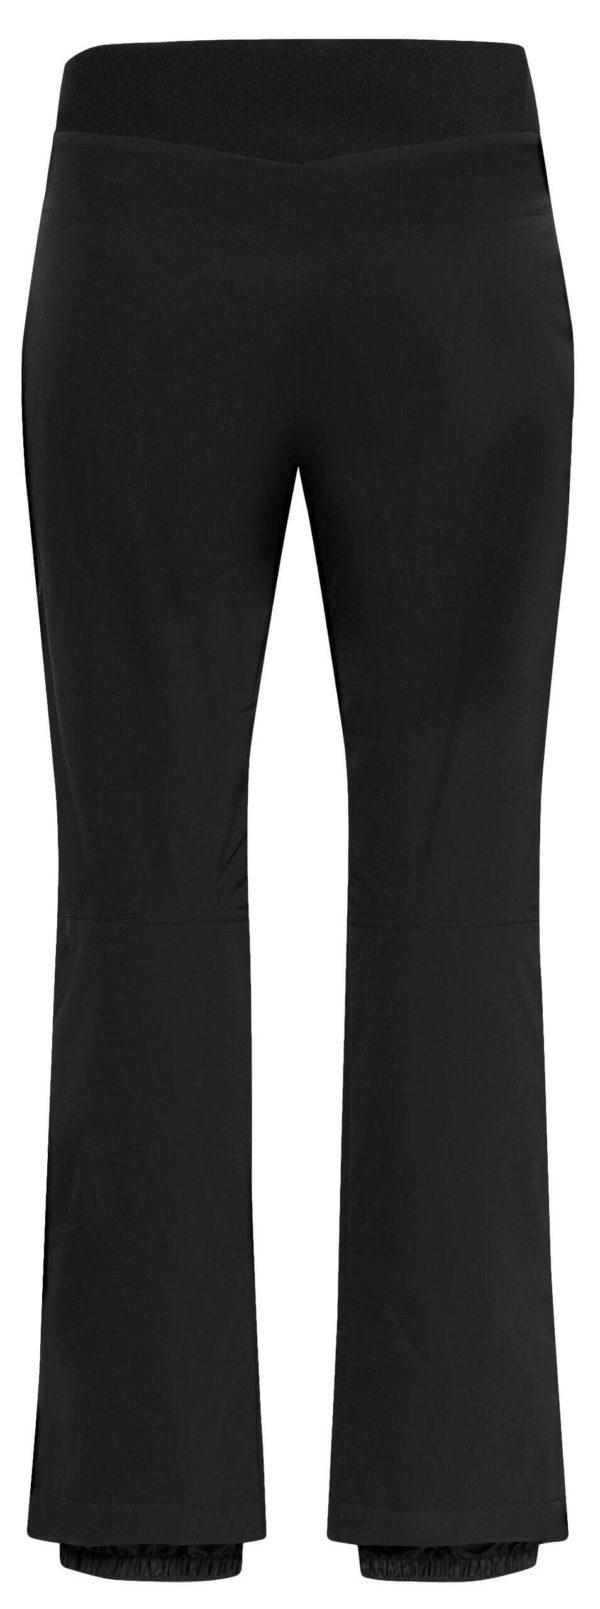 Женские брюки Descente Harriet (стандарт) - фото 2